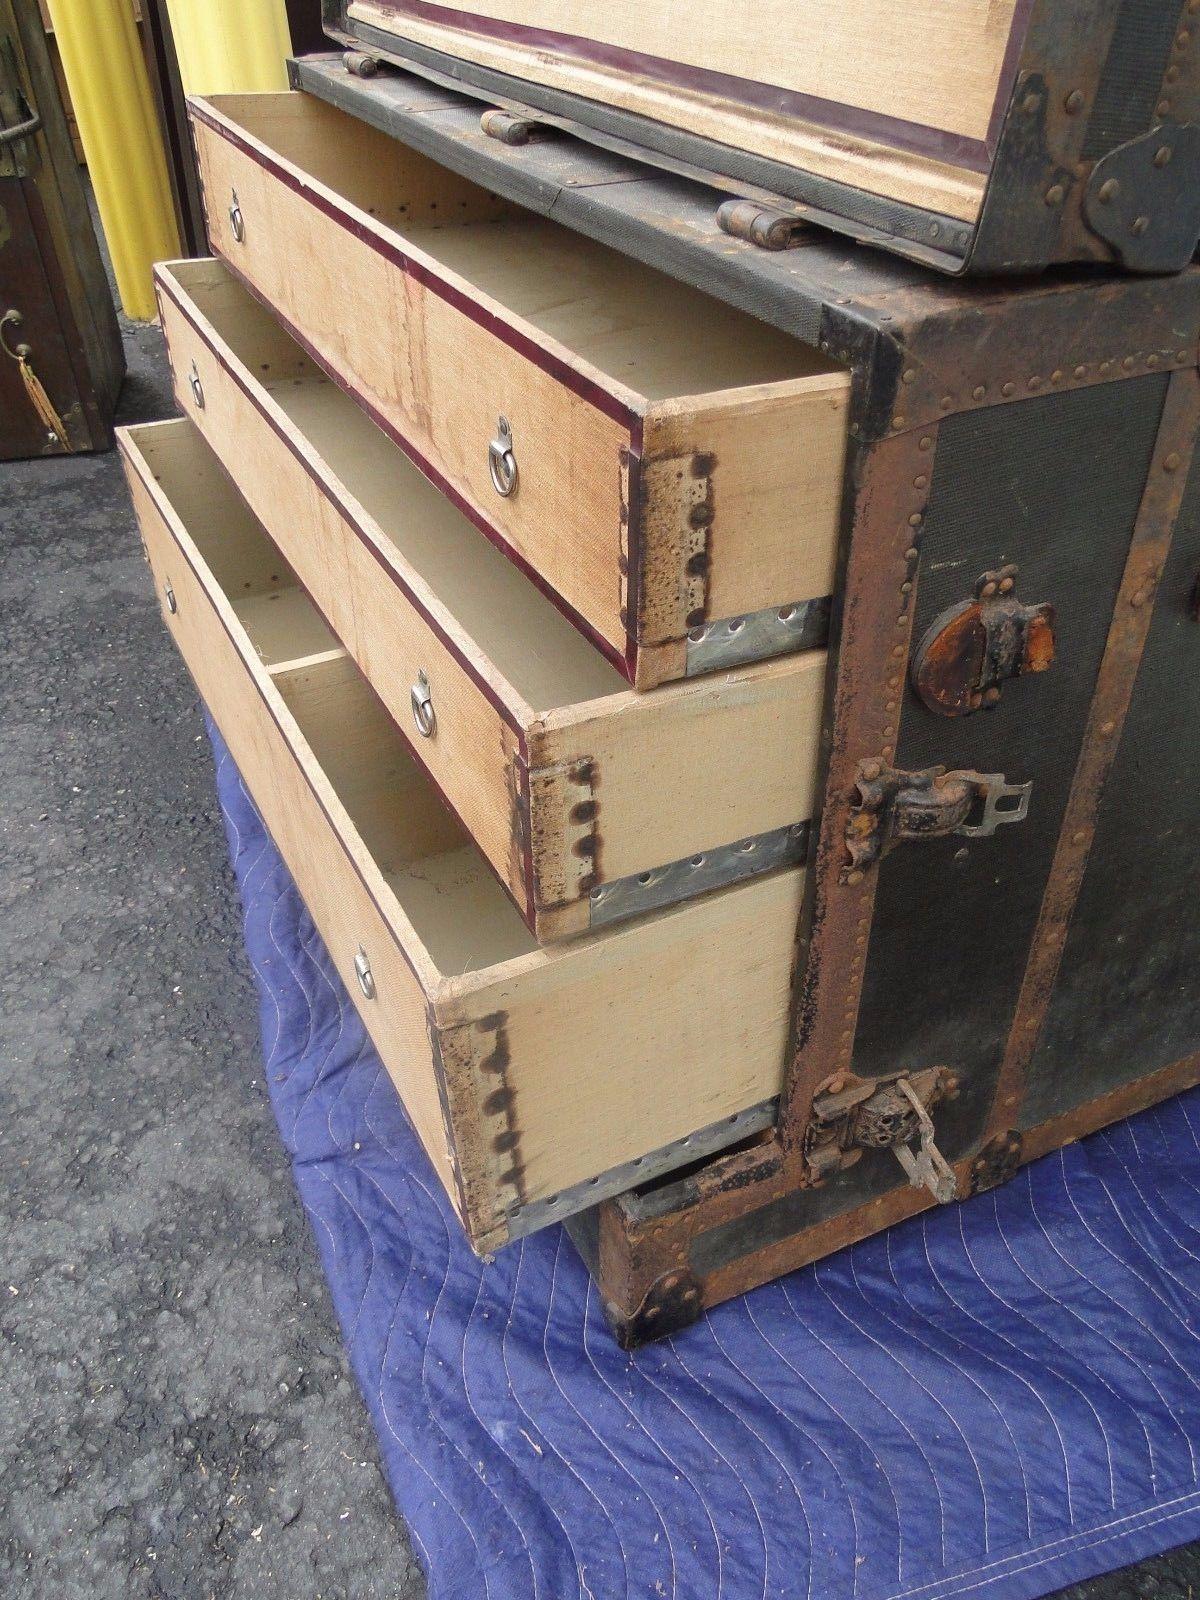 Rare Frank A Stallman Columbus Ohio Dresser Trunk Unusual | eBay - Rare Frank A Stallman Columbus Ohio Dresser Trunk Unusual